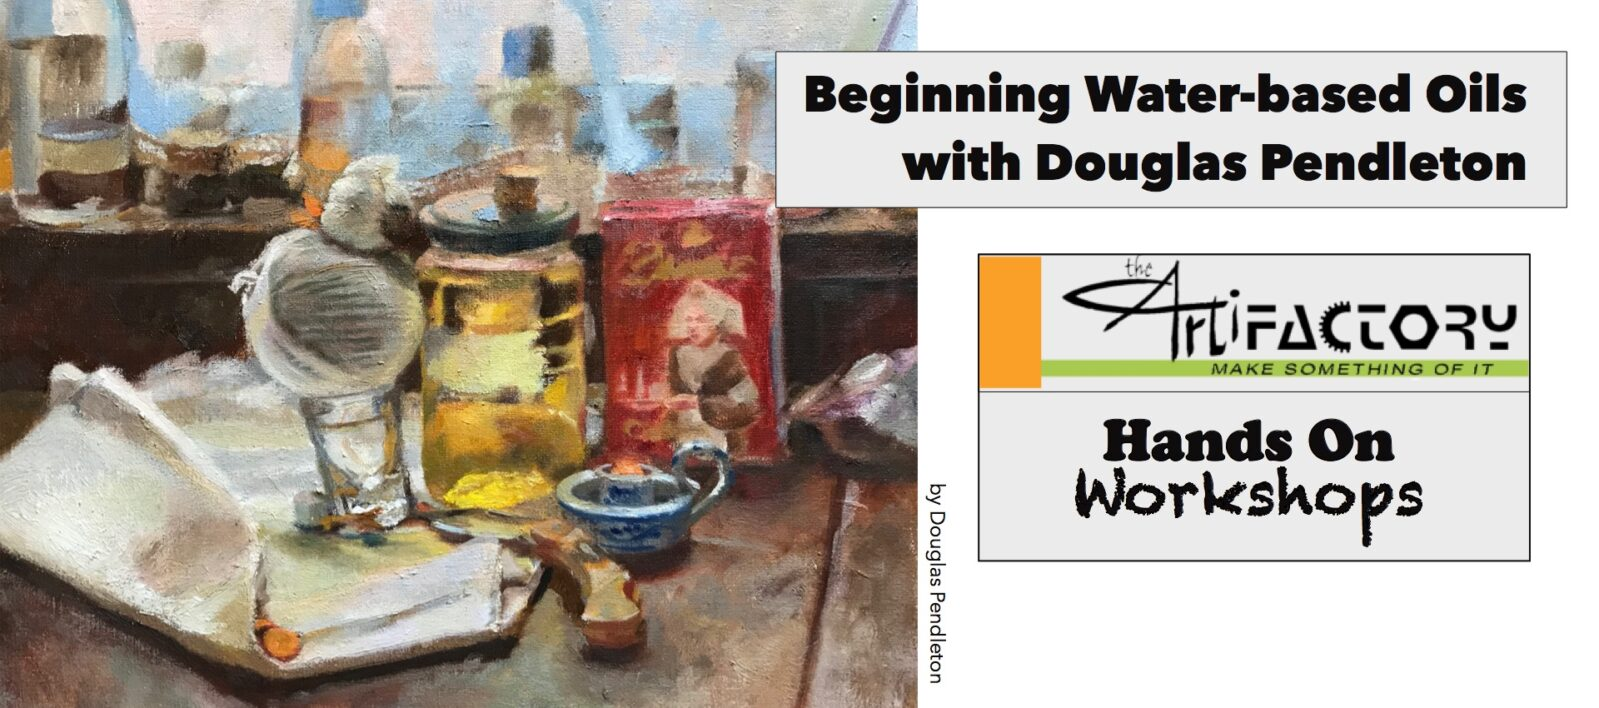 Beginning Water-based Oils